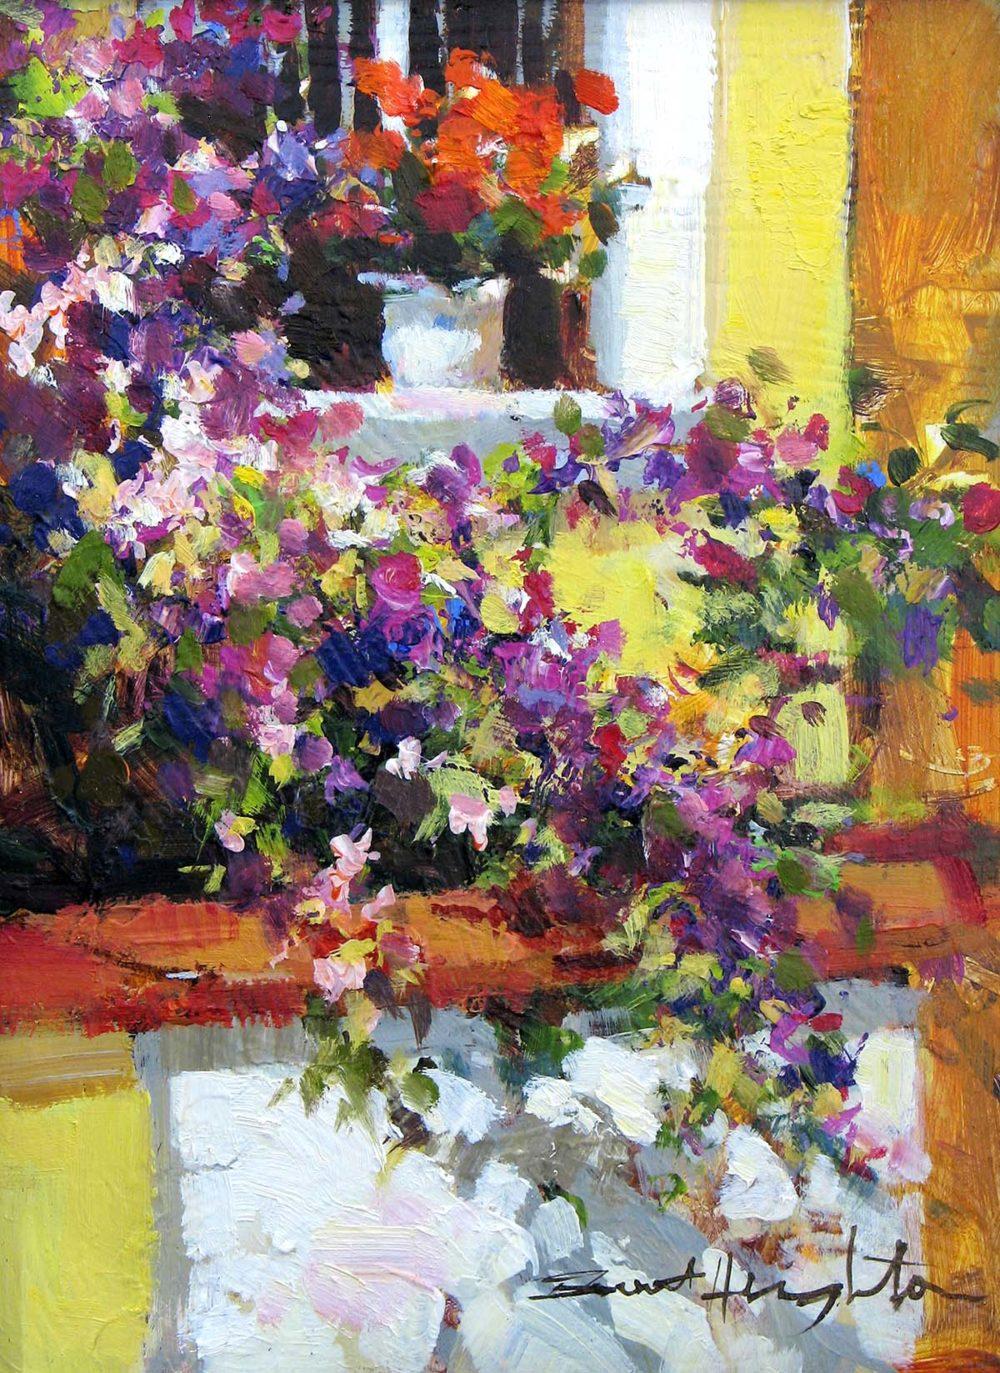 Sunlite Window - Brent Heighton